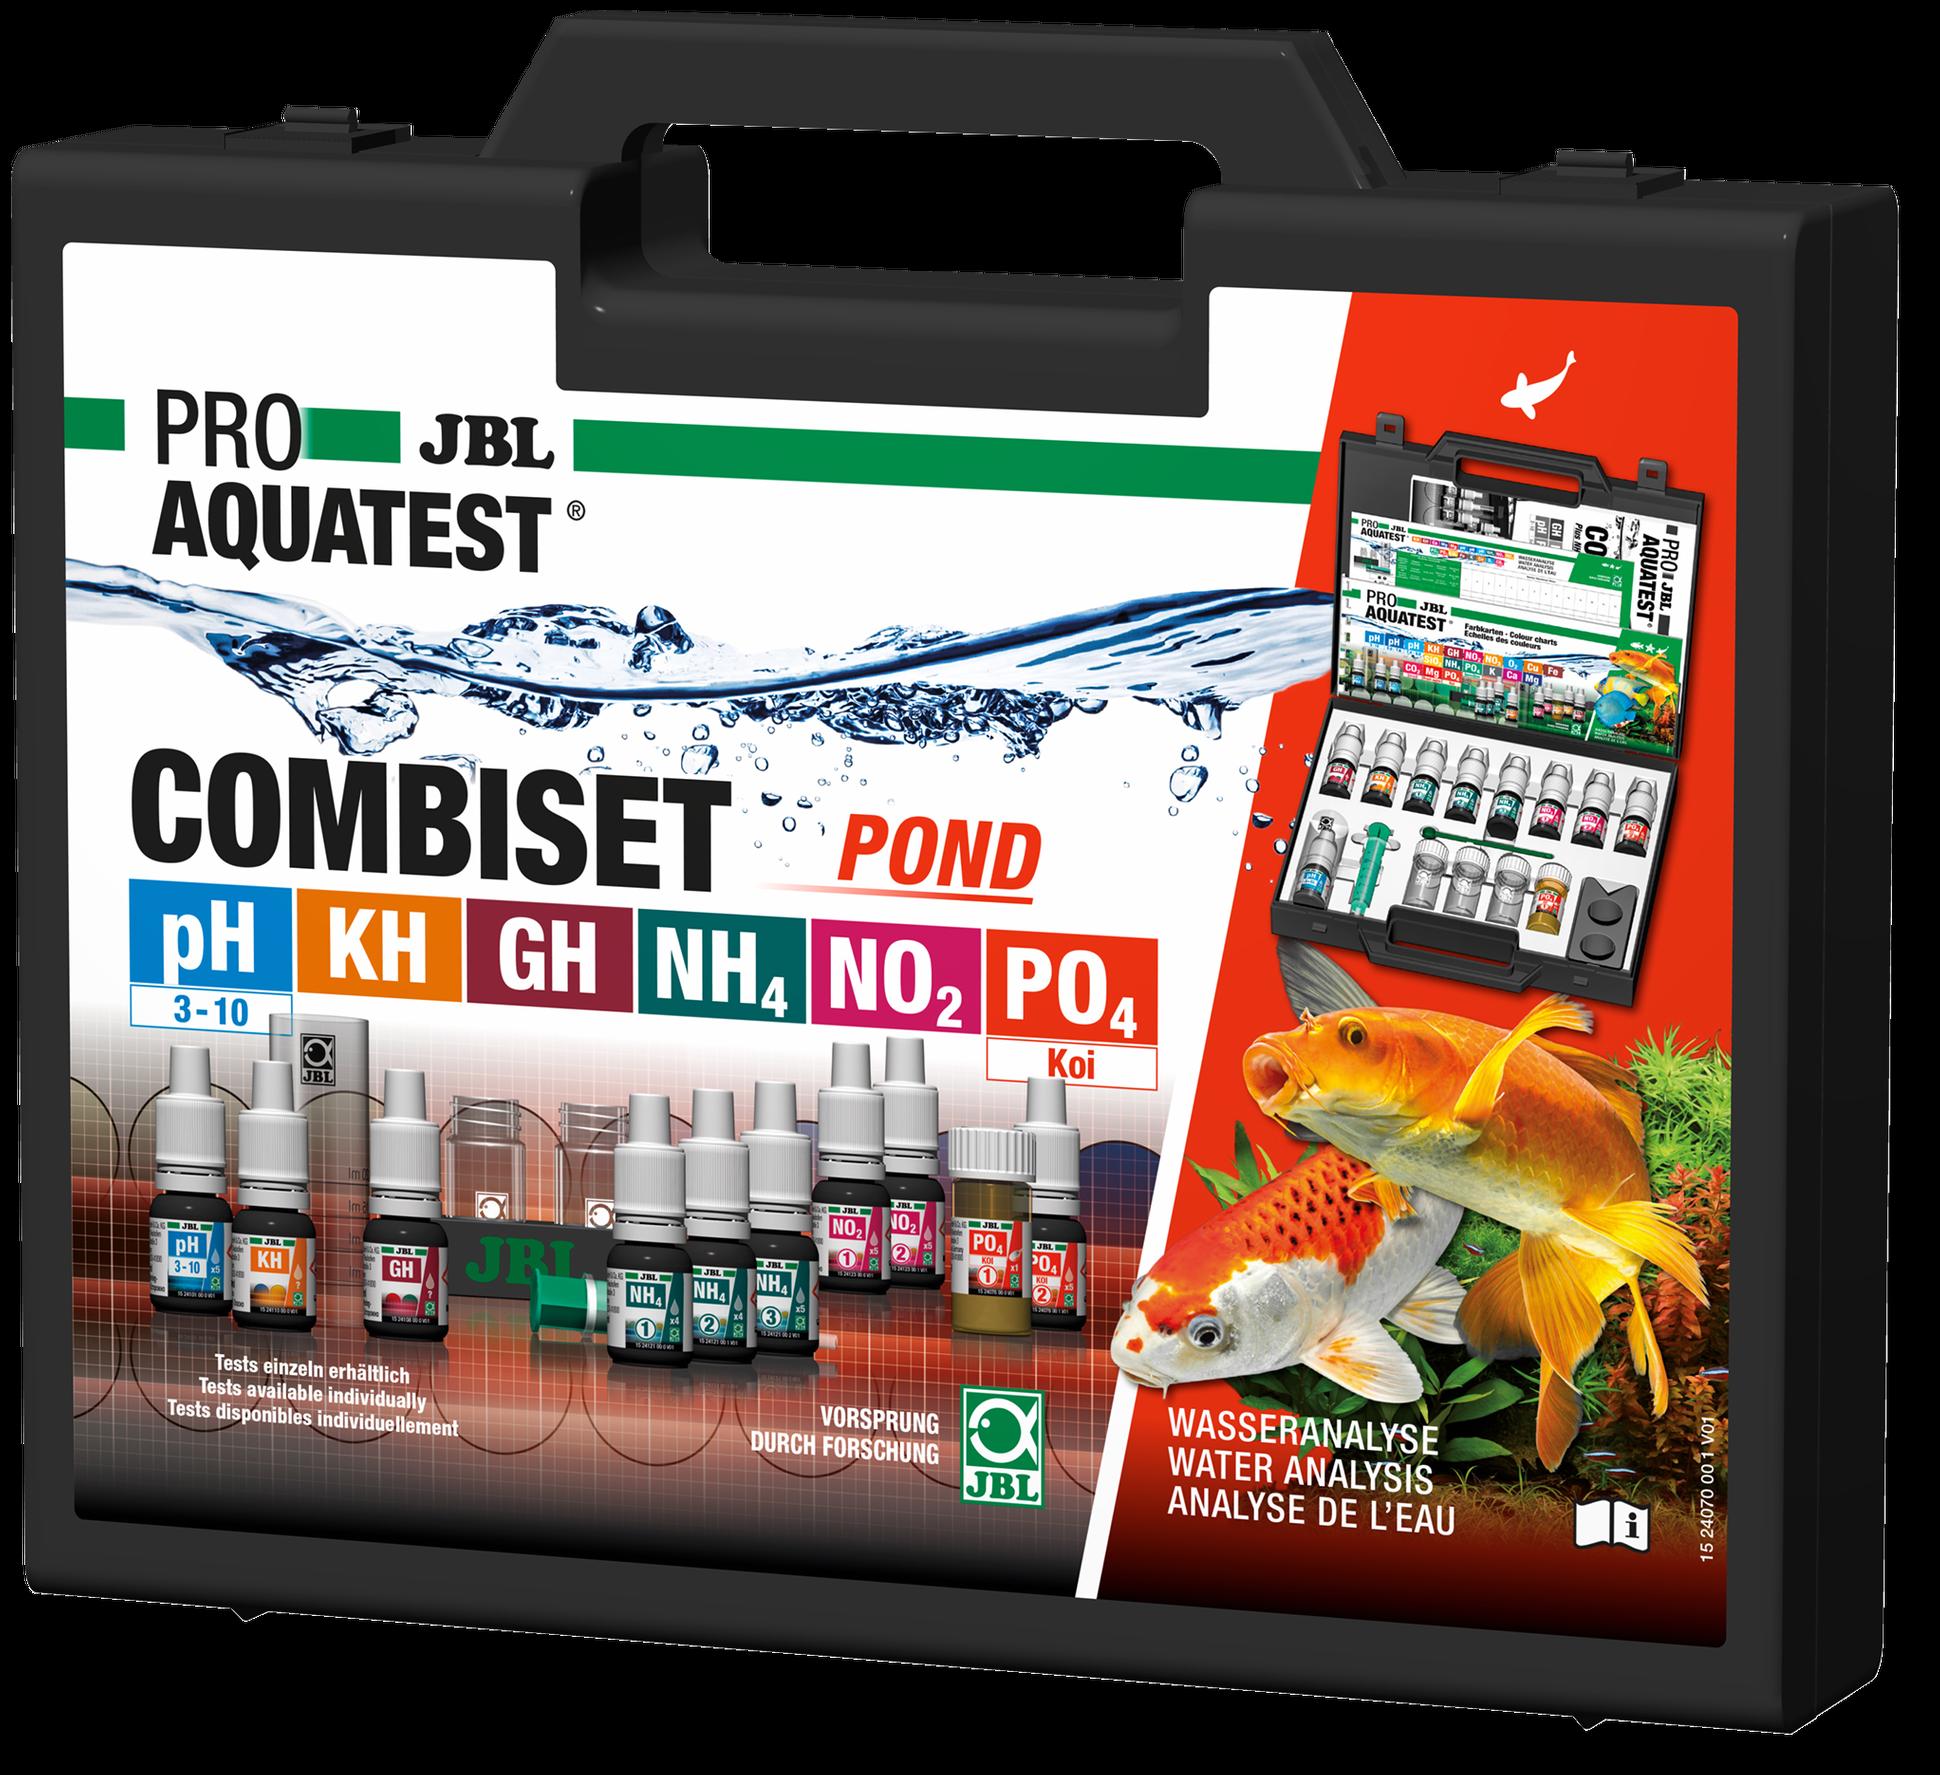 JBL PROAQUATEST COMBISET POND Teich ( 6 Tests )